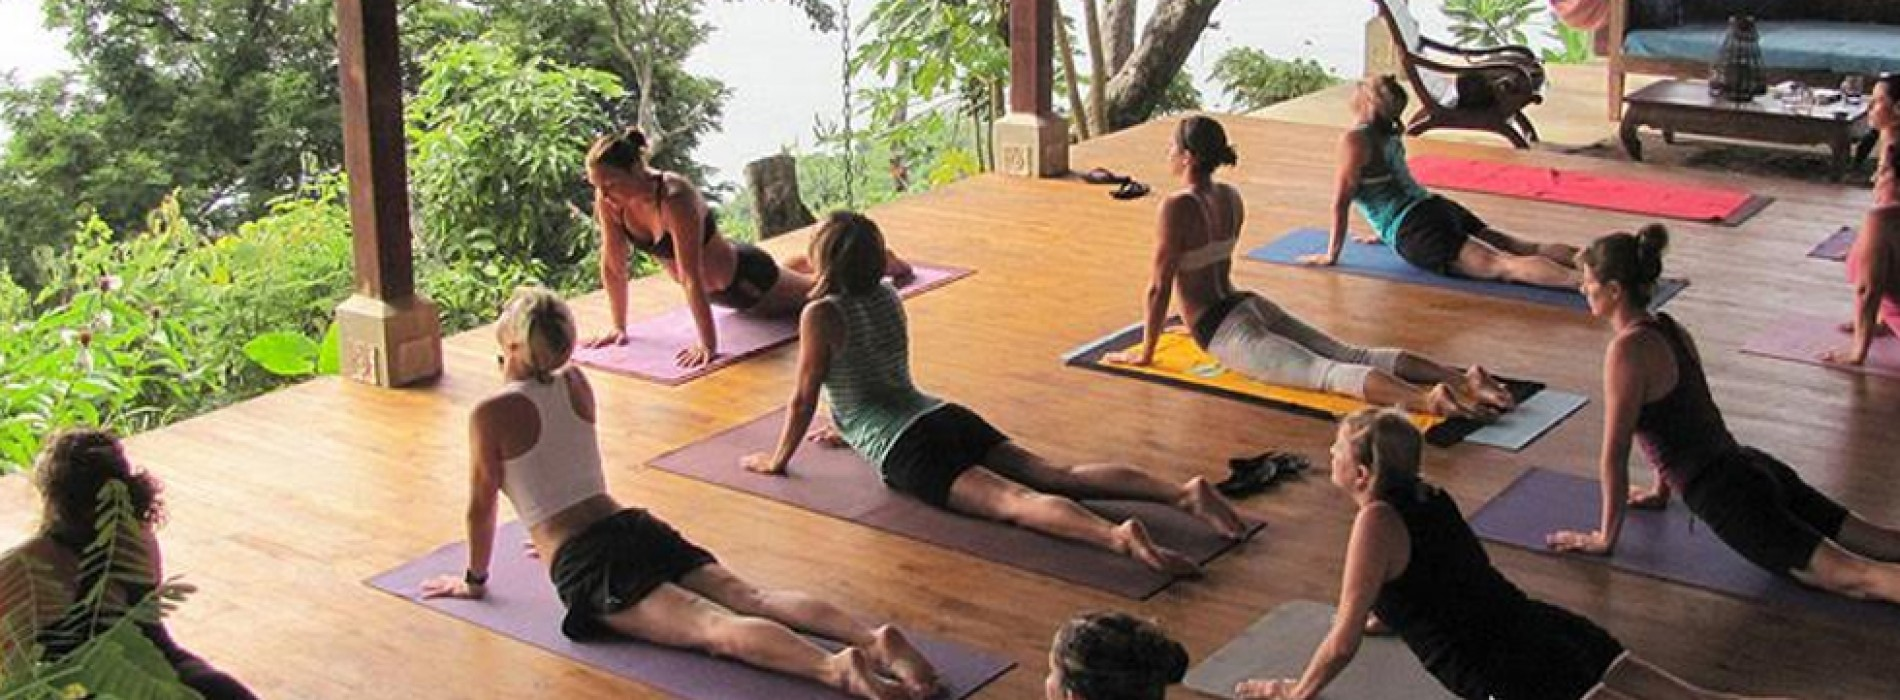 YOGA in GOA: This International Yoga Day 21st June 2017